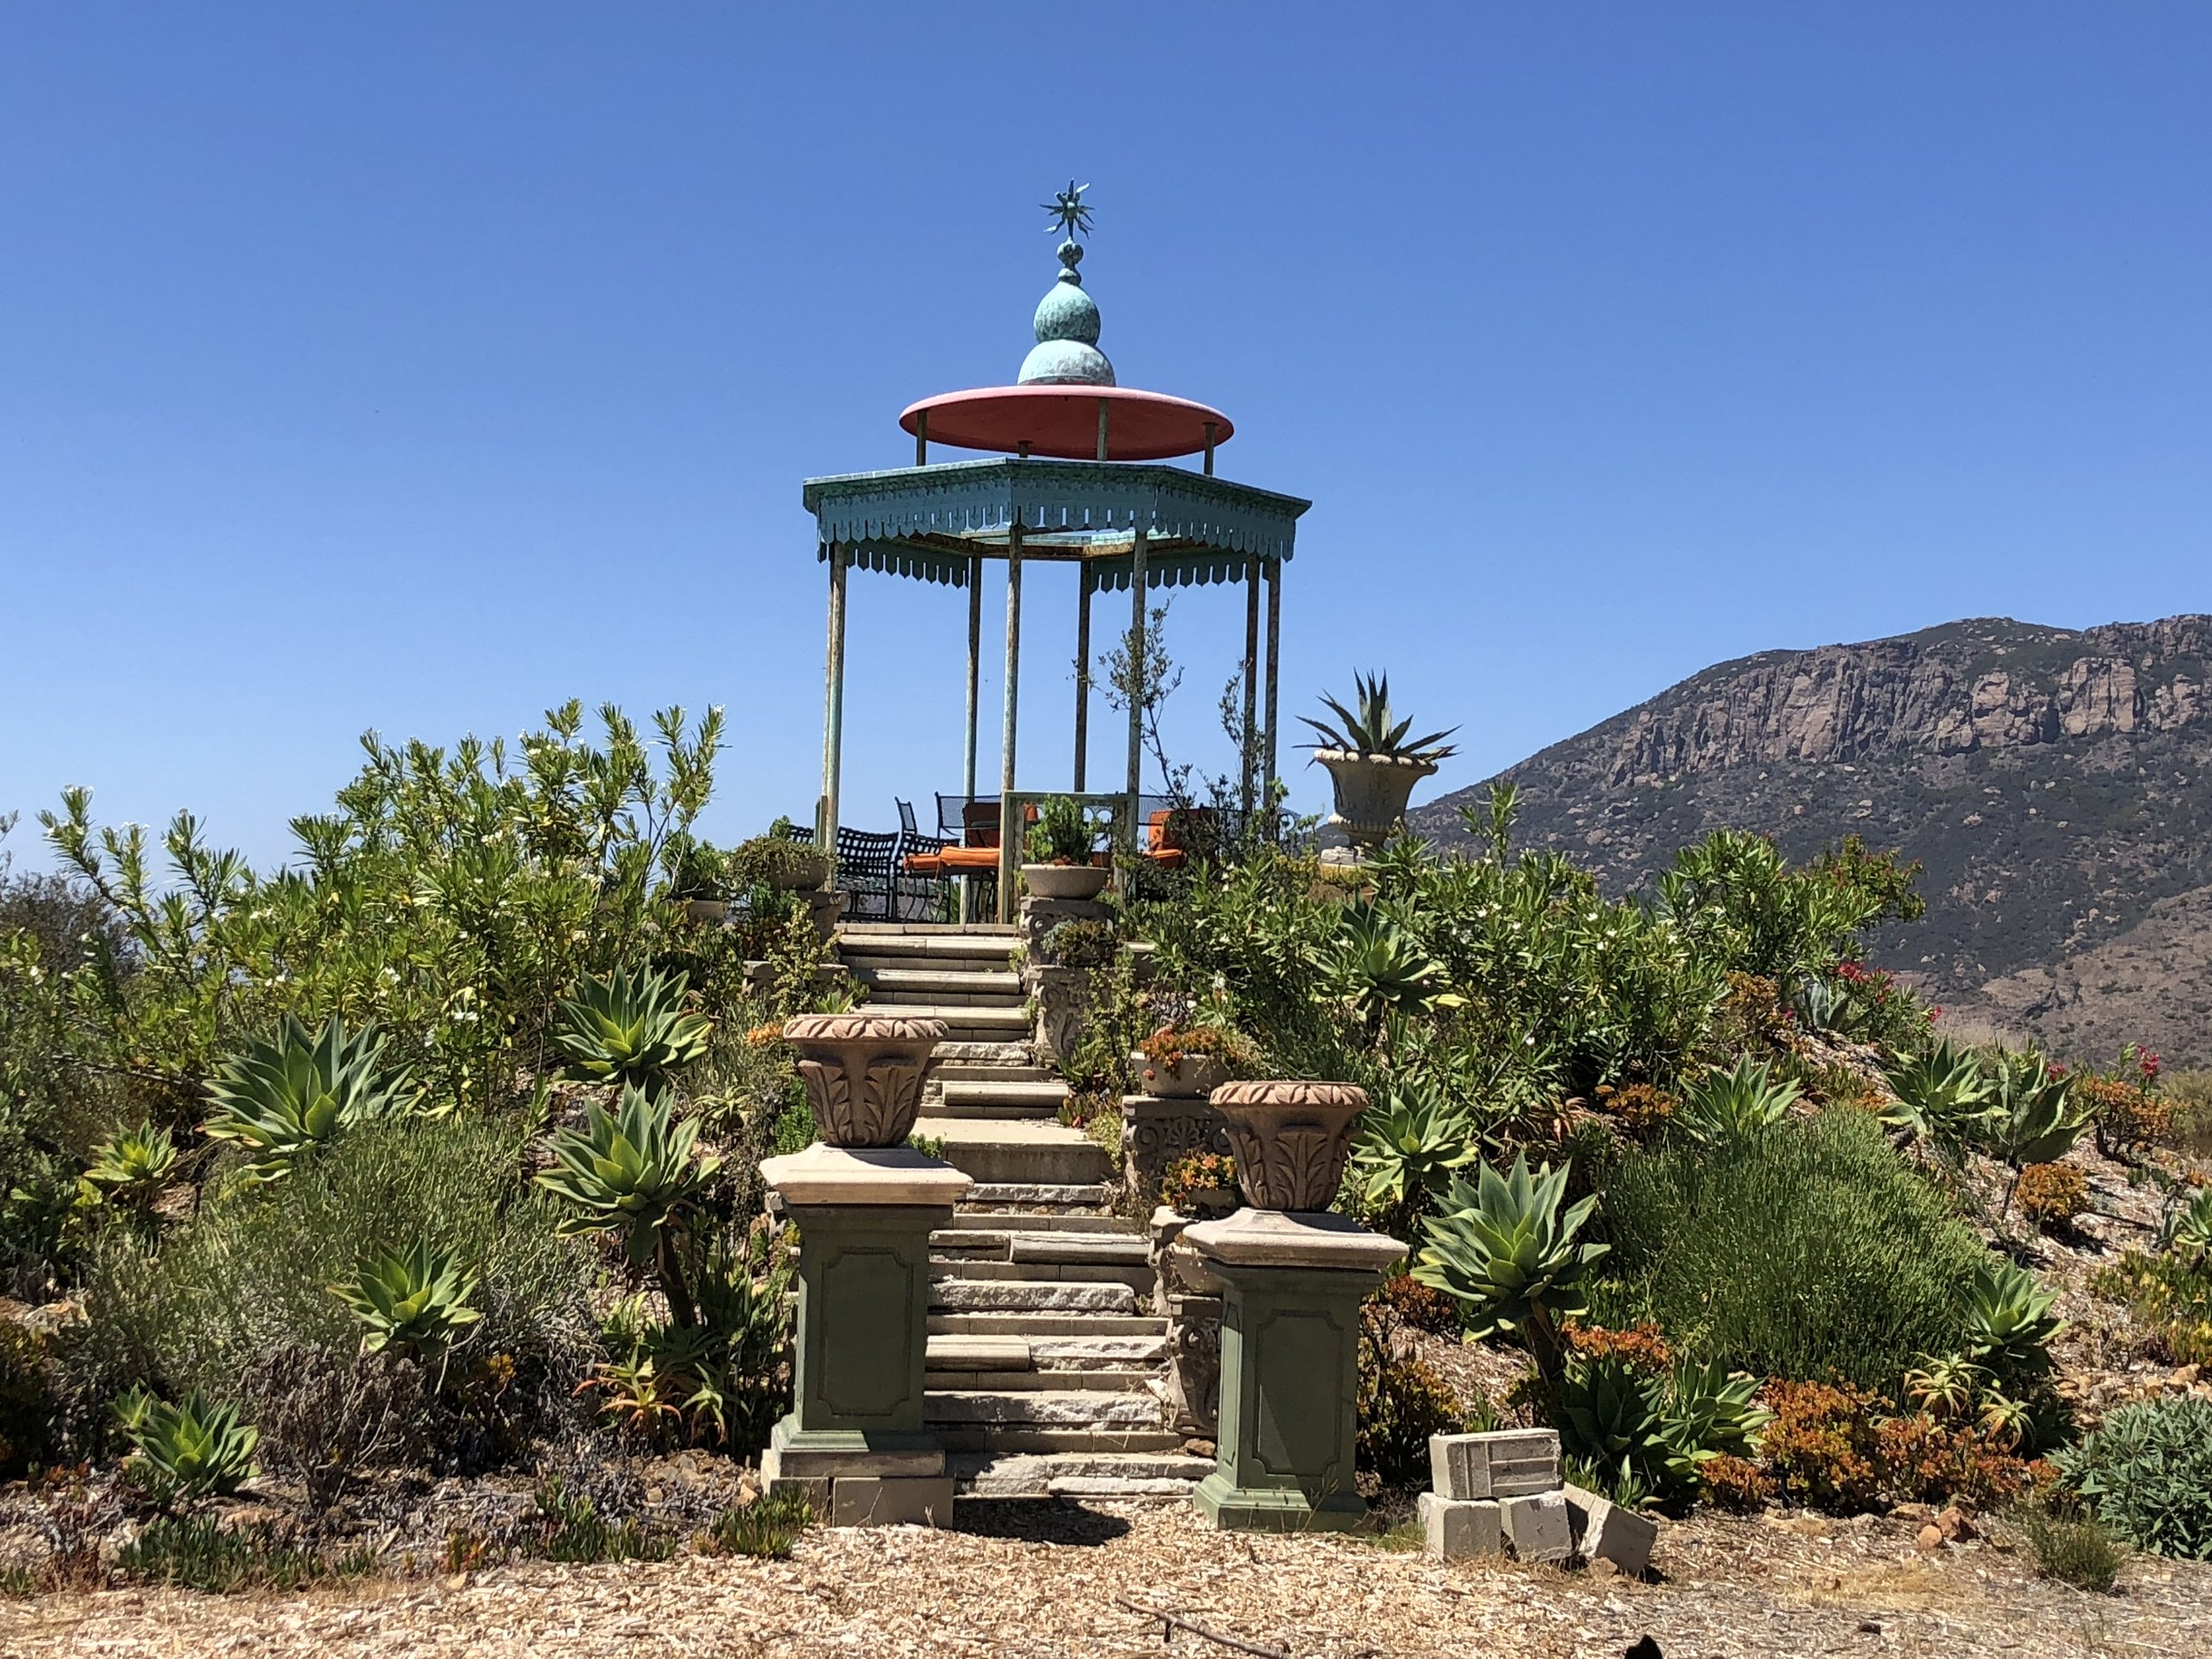 S.E.A.-Studio-Environmental-Architecture-David-Hertz-FAIA-Tony-Duquette-Xanabu-Malibu-California-adaptive-reuse-sustainable-regenerative-restorative-green-design-airplane-upcycle-recycle-found-object-historic-preservation-Hollywood-set-bony-ridge-4.jpeg